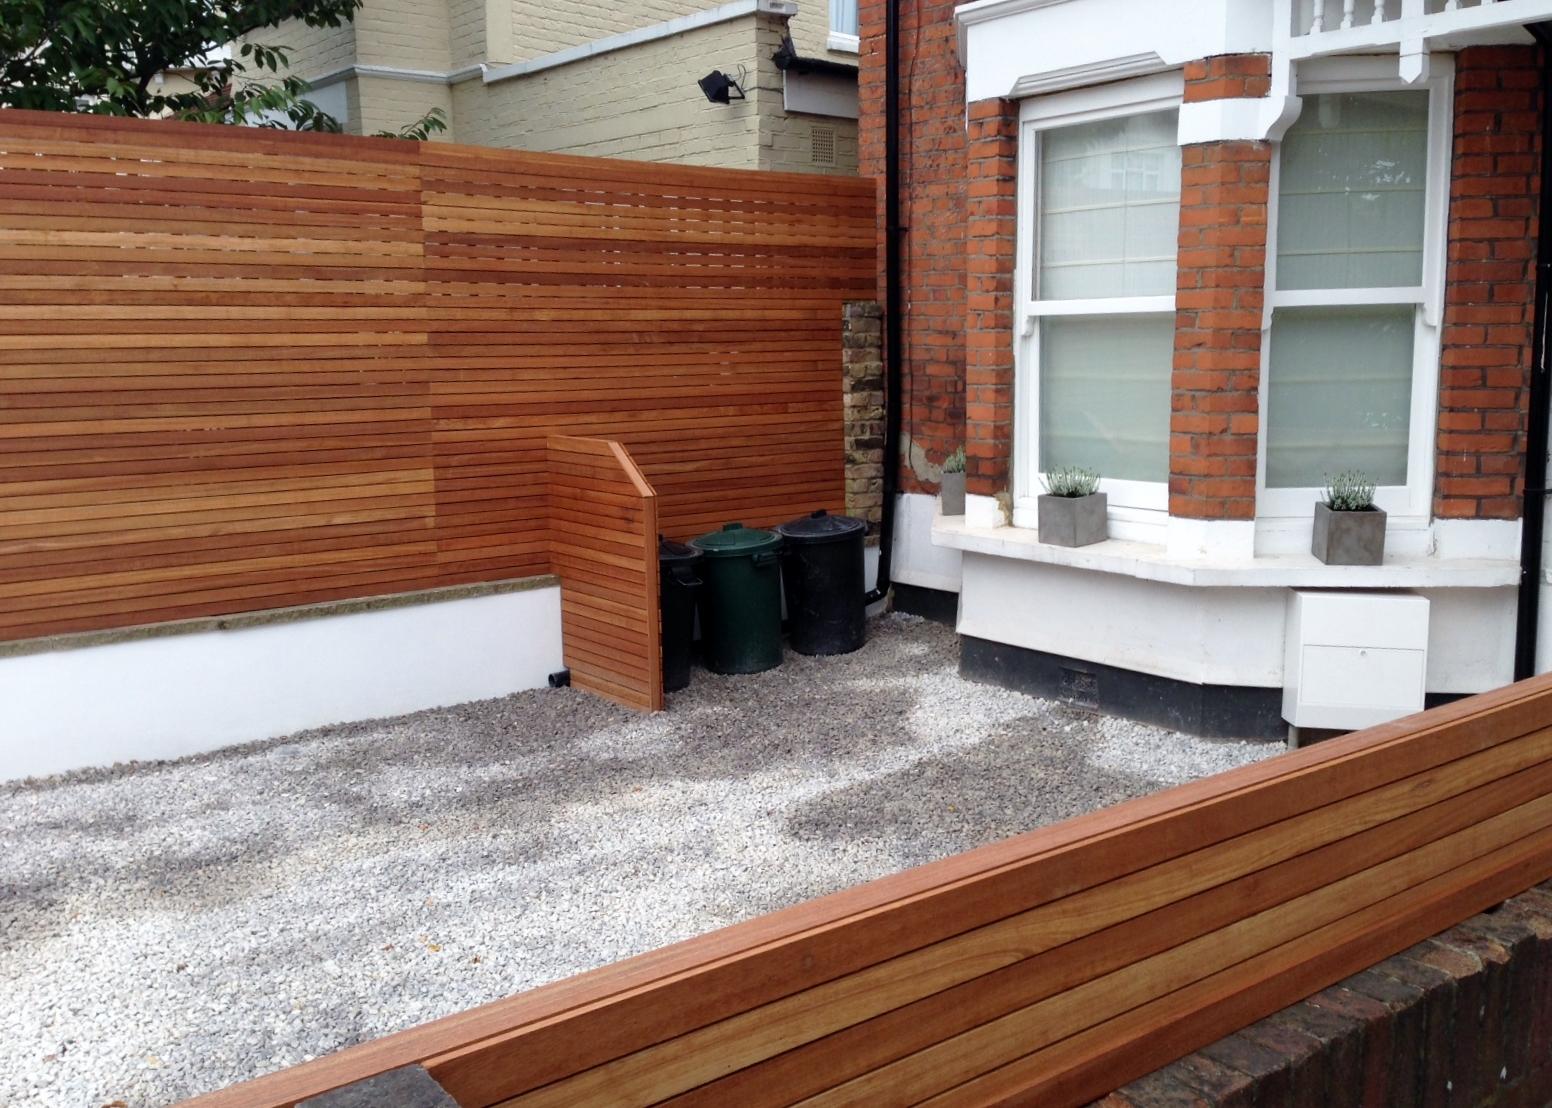 front garden drivewat gravel travertine paving path hardwood privacy screen trellis tooting london (18)